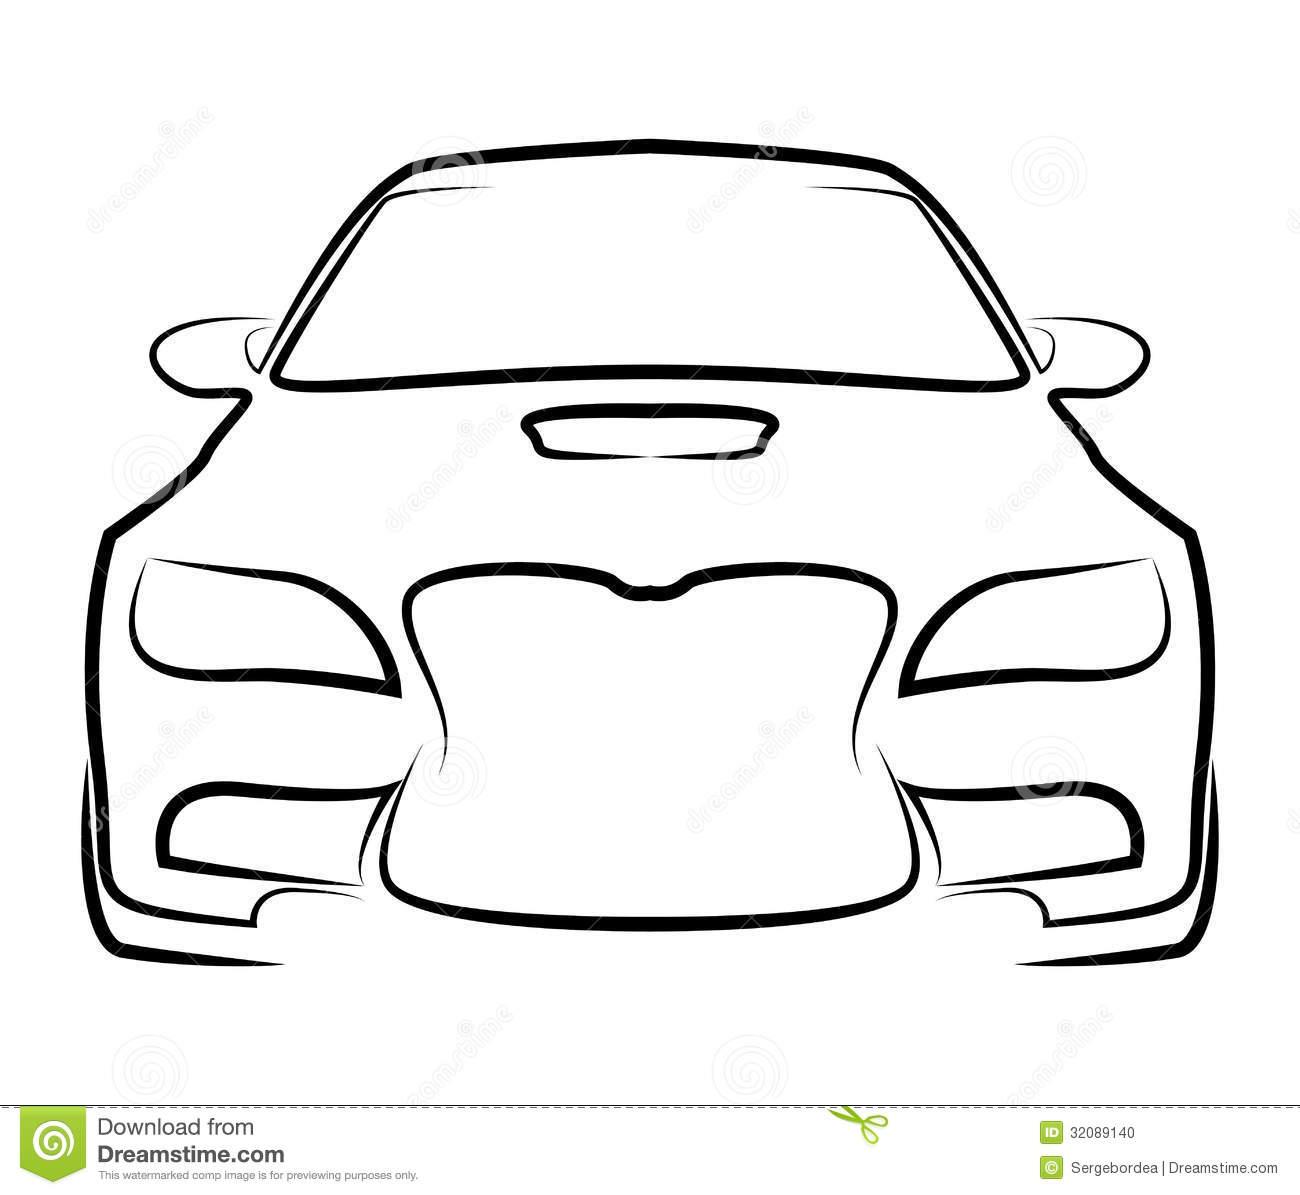 Car Silhouette Vector Free Download at GetDrawings.com